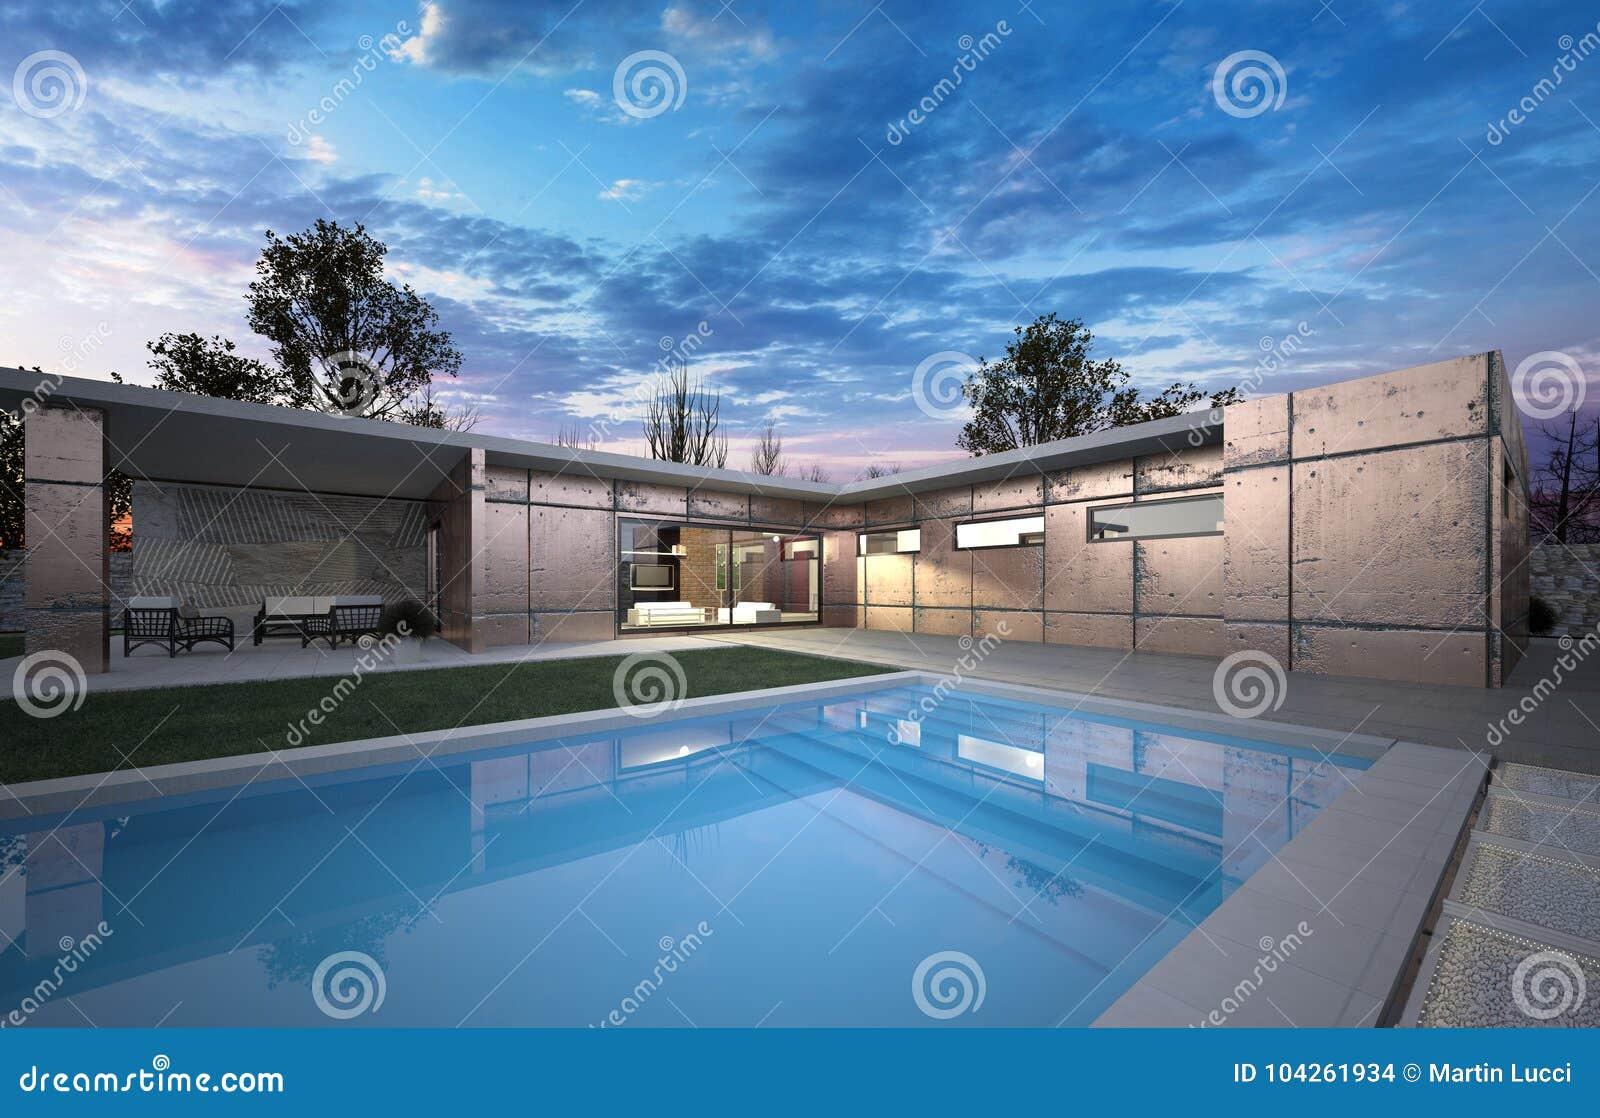 Luxury modern a big house with l shape and swim pool